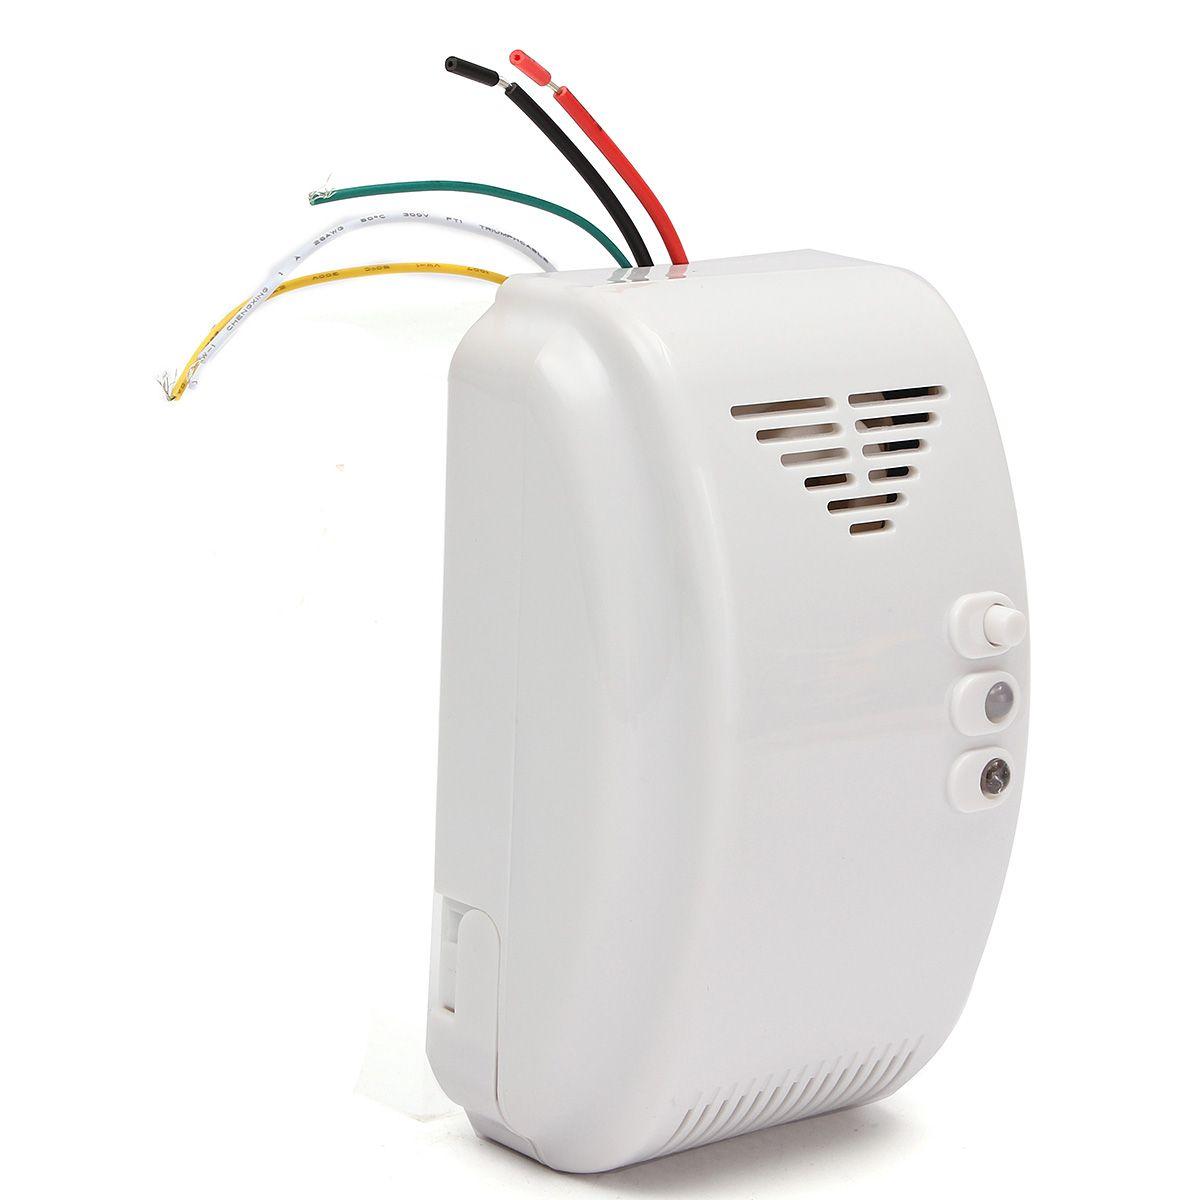 NEW 12V Gas Detector Sensor Alarm Propane Butane LPG Natural Motorhome For Home Alarm System Security